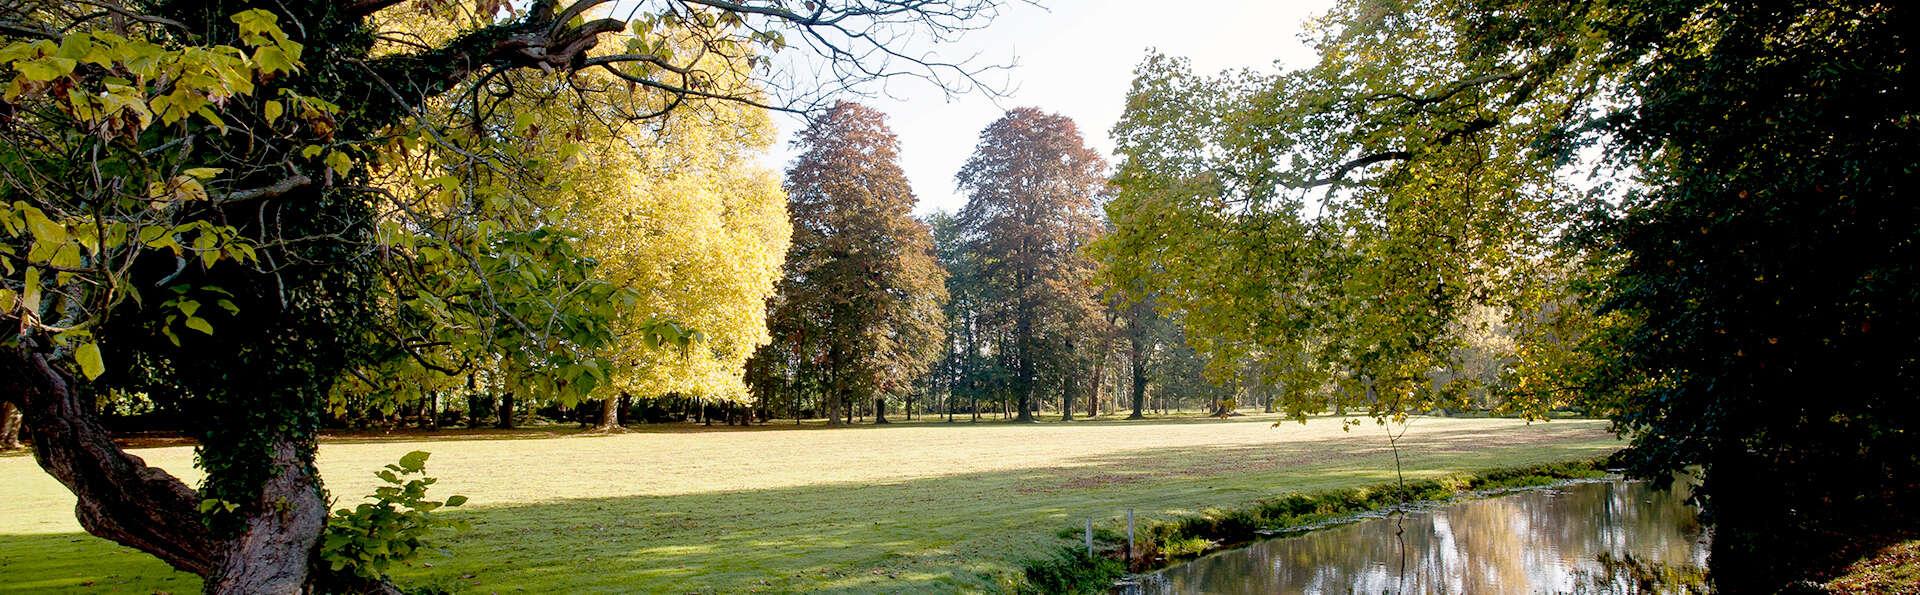 Château de Saulon - Edit_garden6.jpg